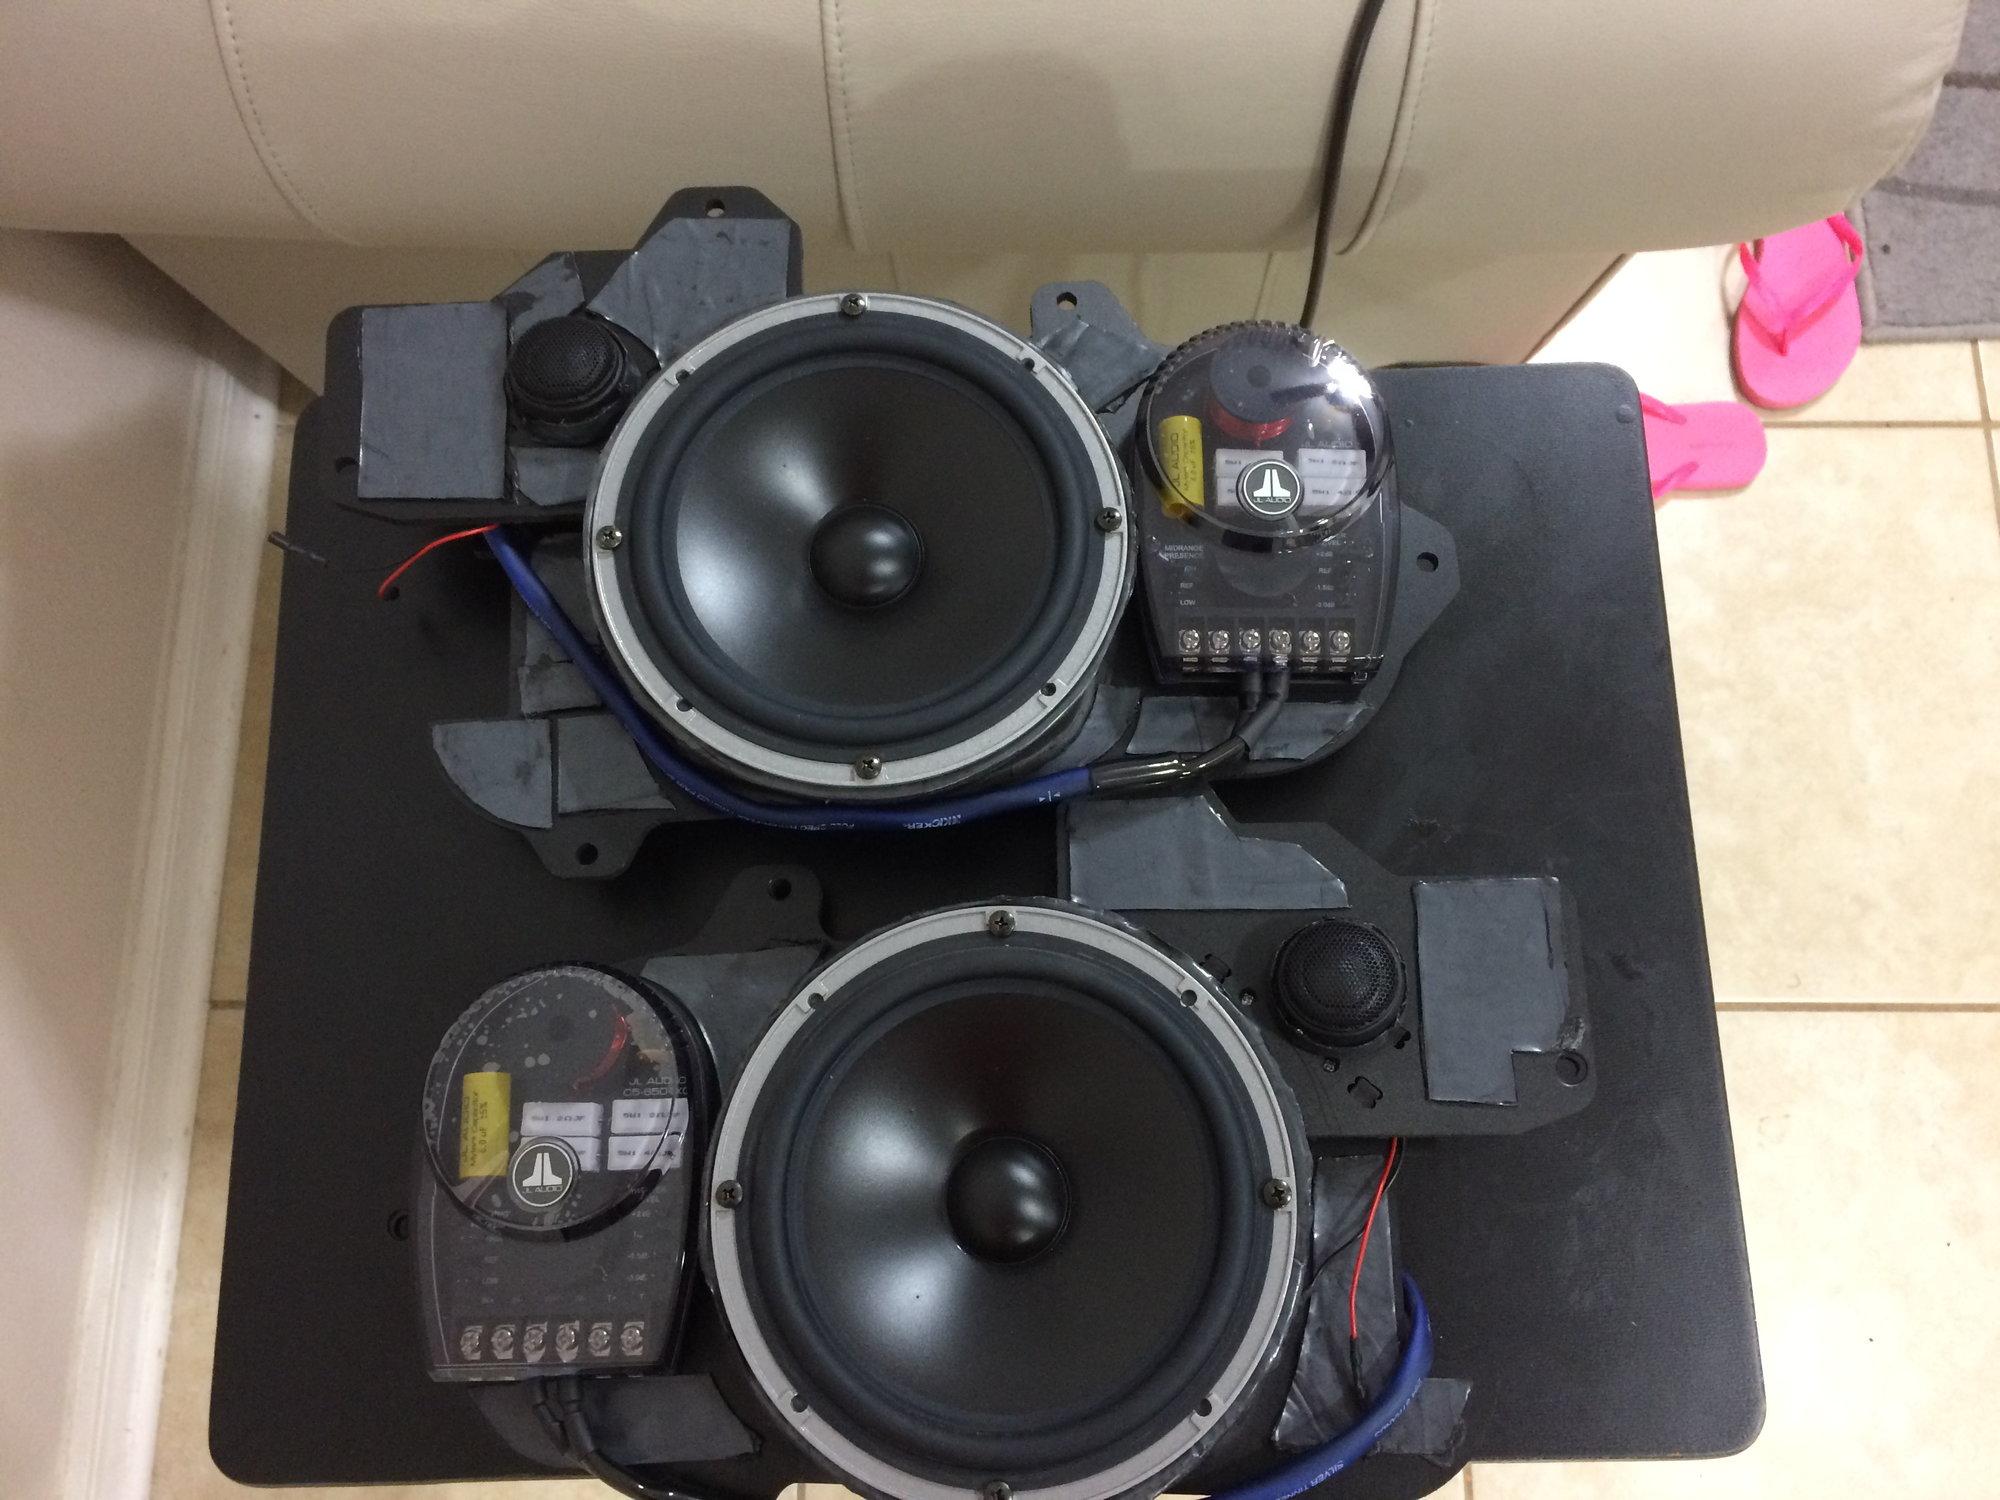 Car Speaker Adapters Gap Between Adapter And Stock Speaker Grill